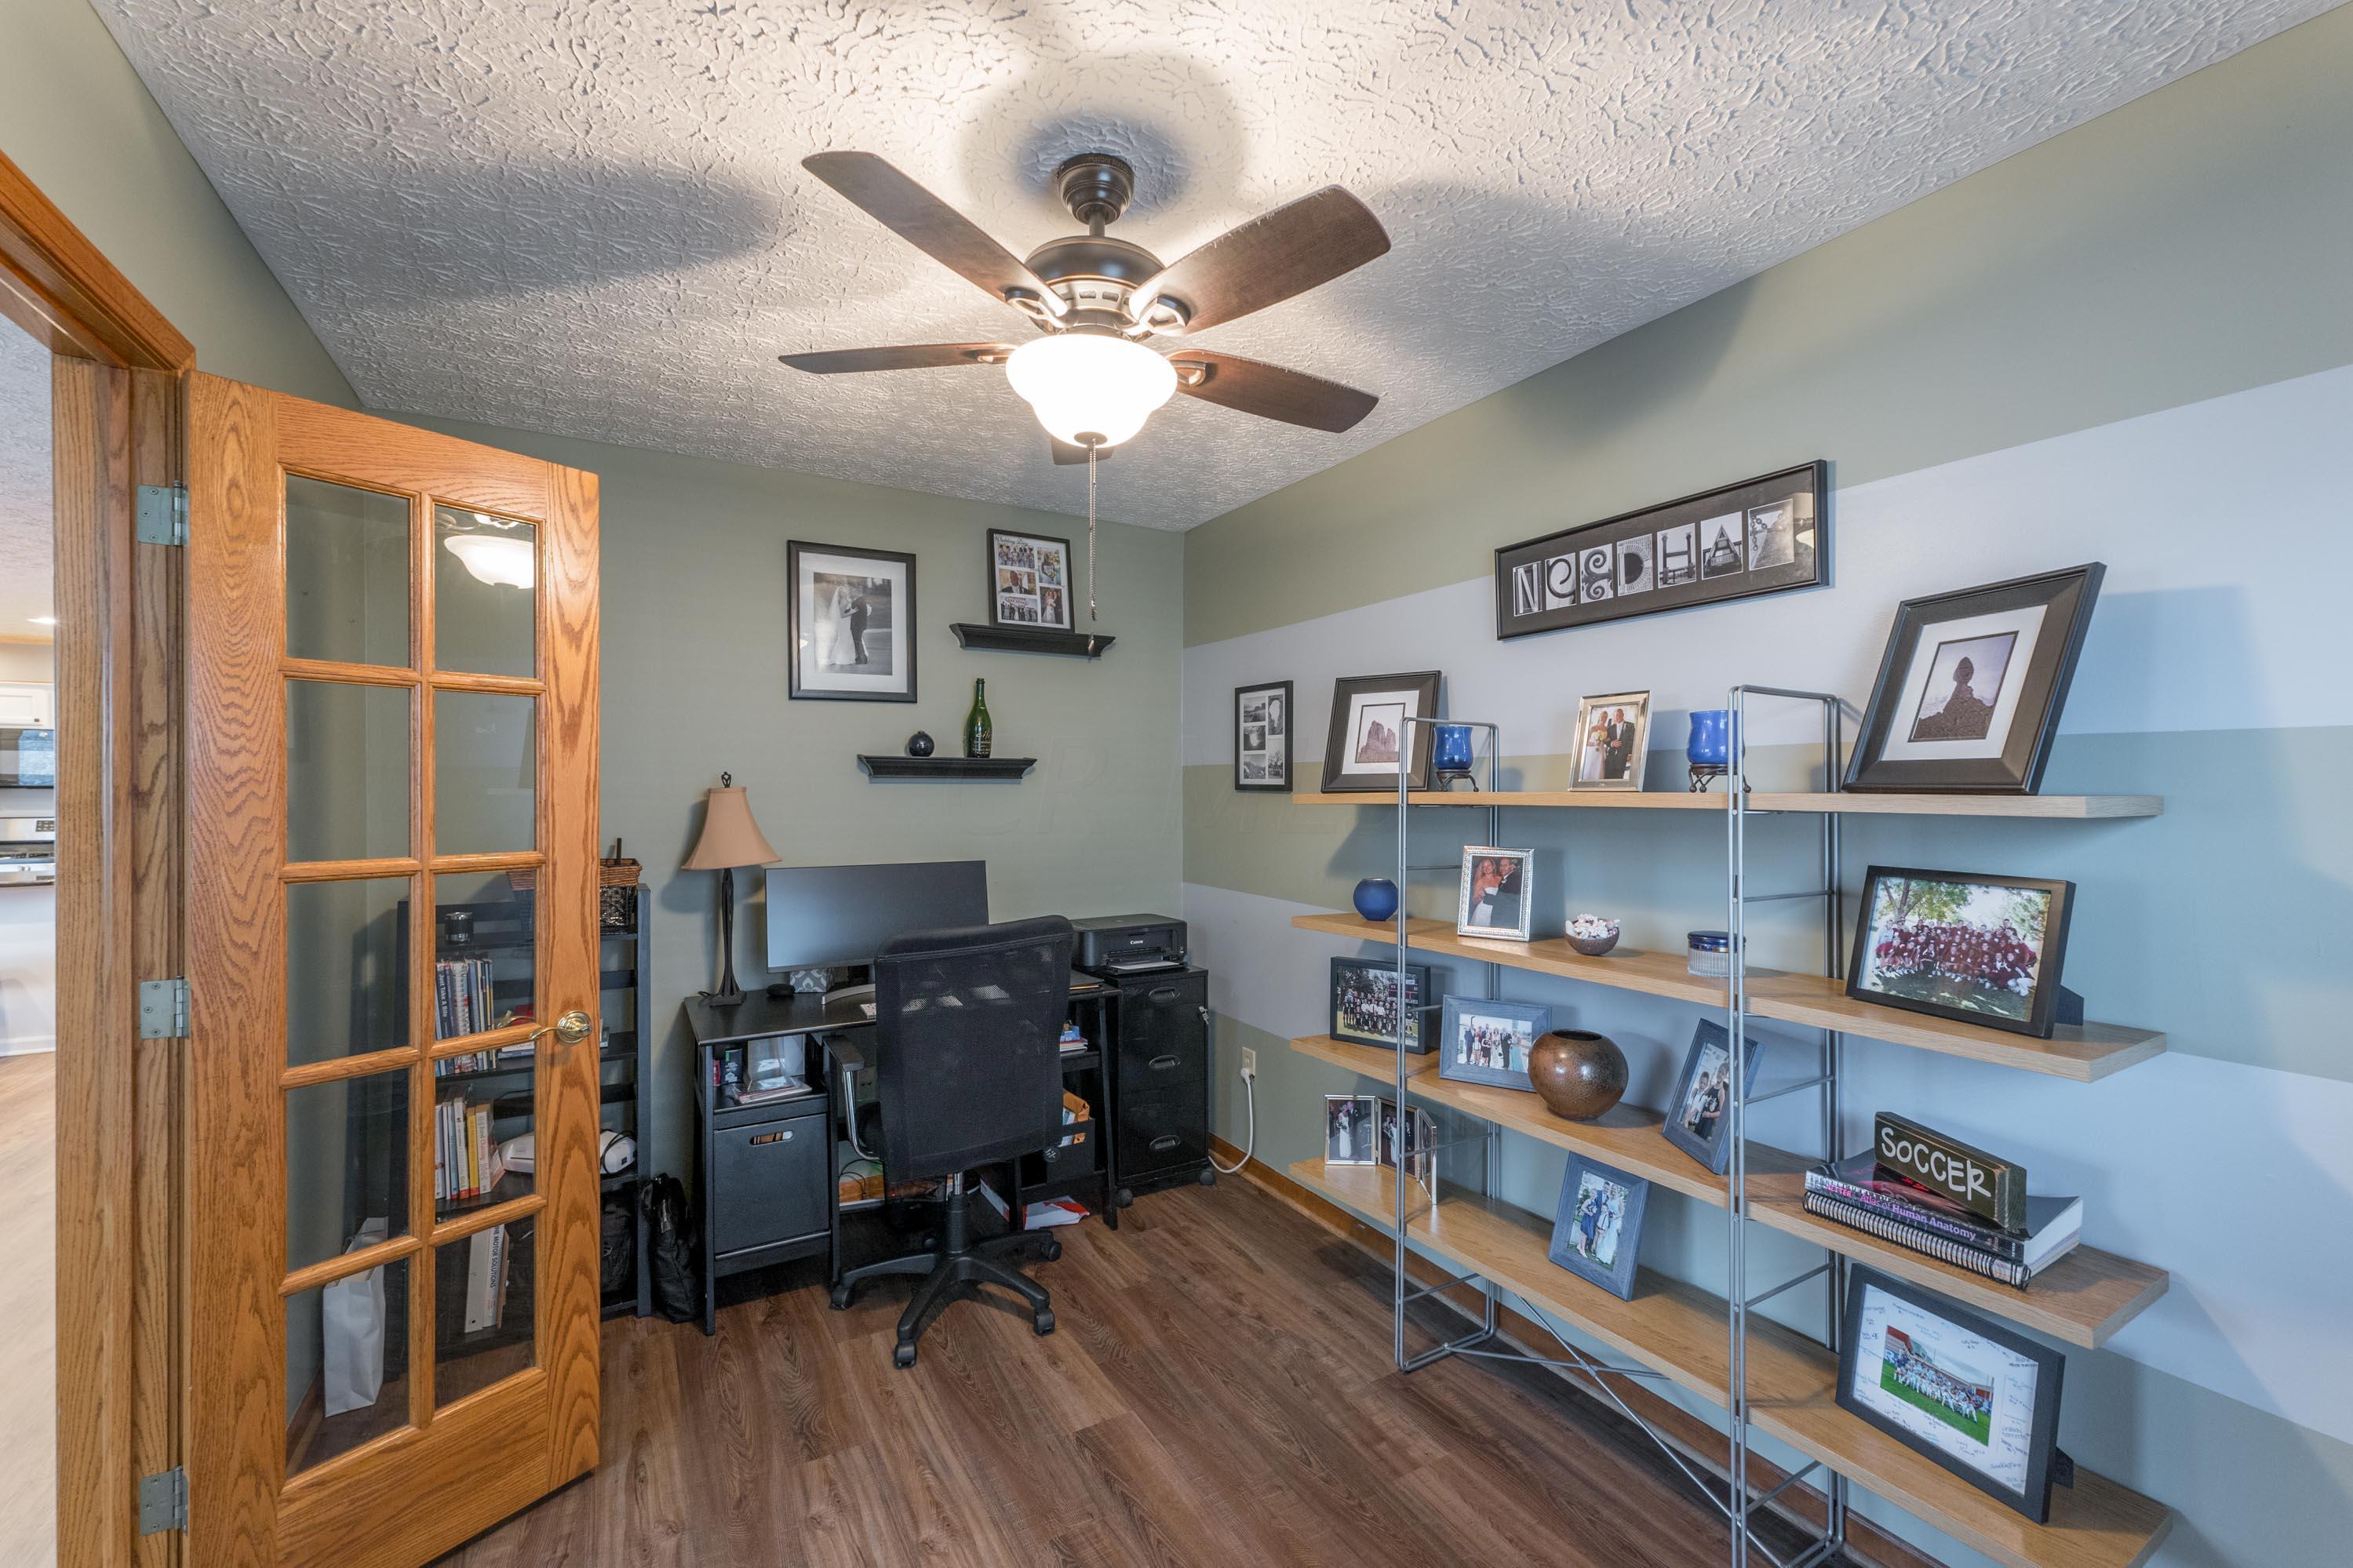 2861 Honeysuckle Lane, Hilliard, Ohio 43026, 4 Bedrooms Bedrooms, ,3 BathroomsBathrooms,Residential,For Sale,Honeysuckle,221000443